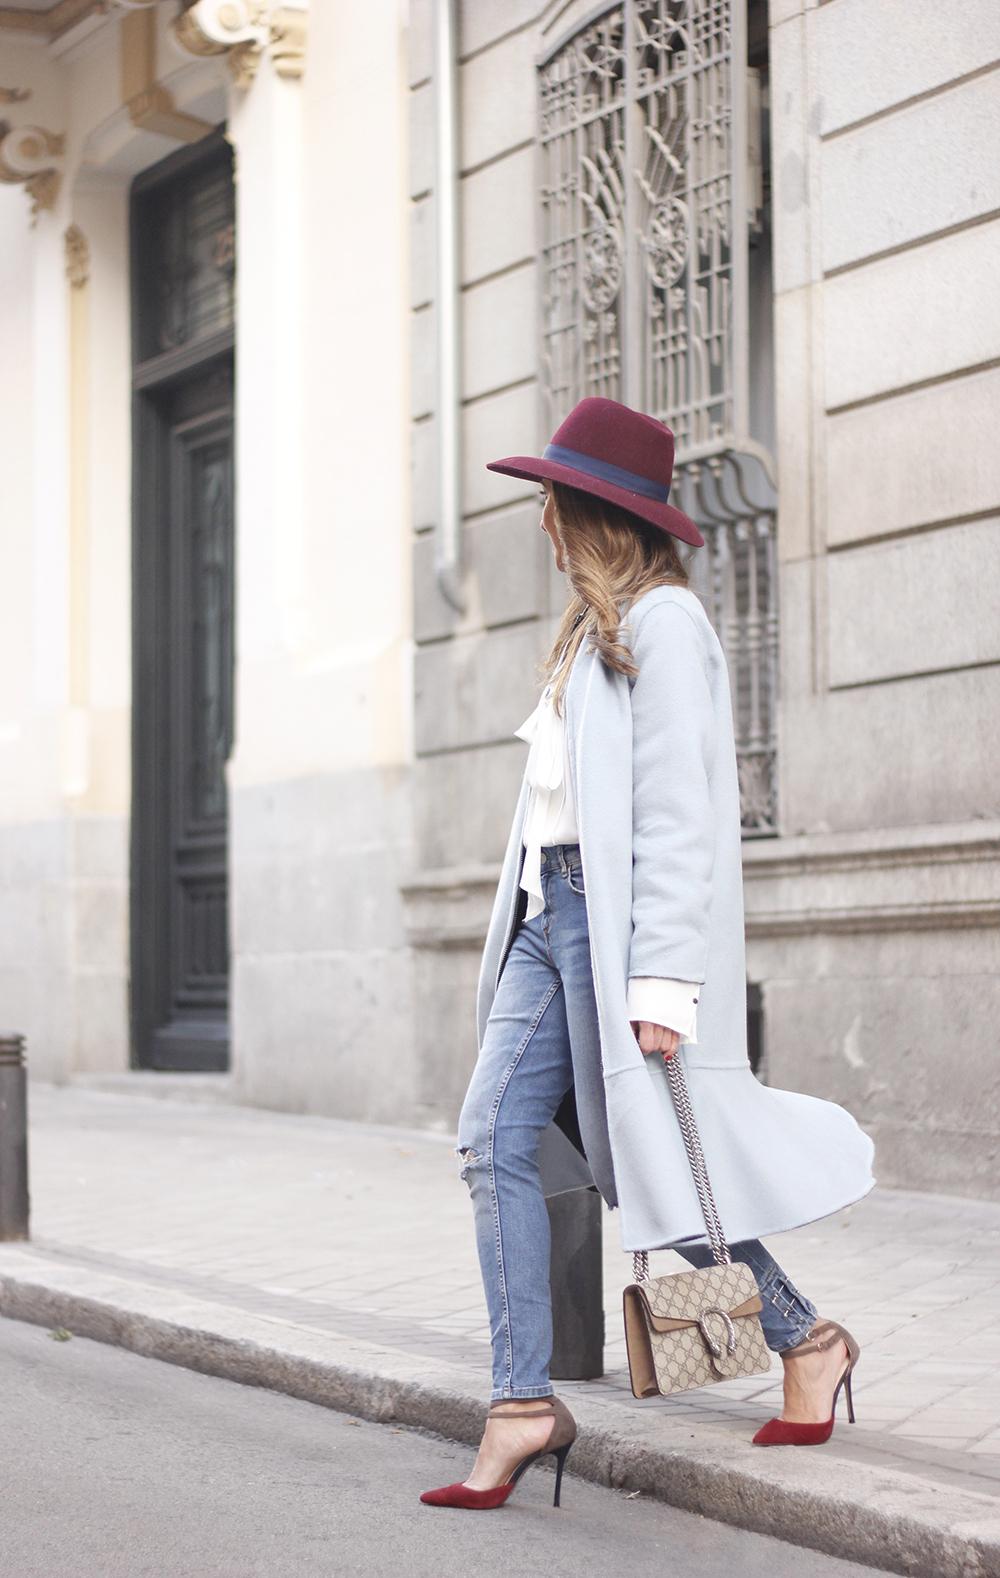 blue coat uterqüe abrigo azul gucci bag burgundy heels winter outfit street style fashion06